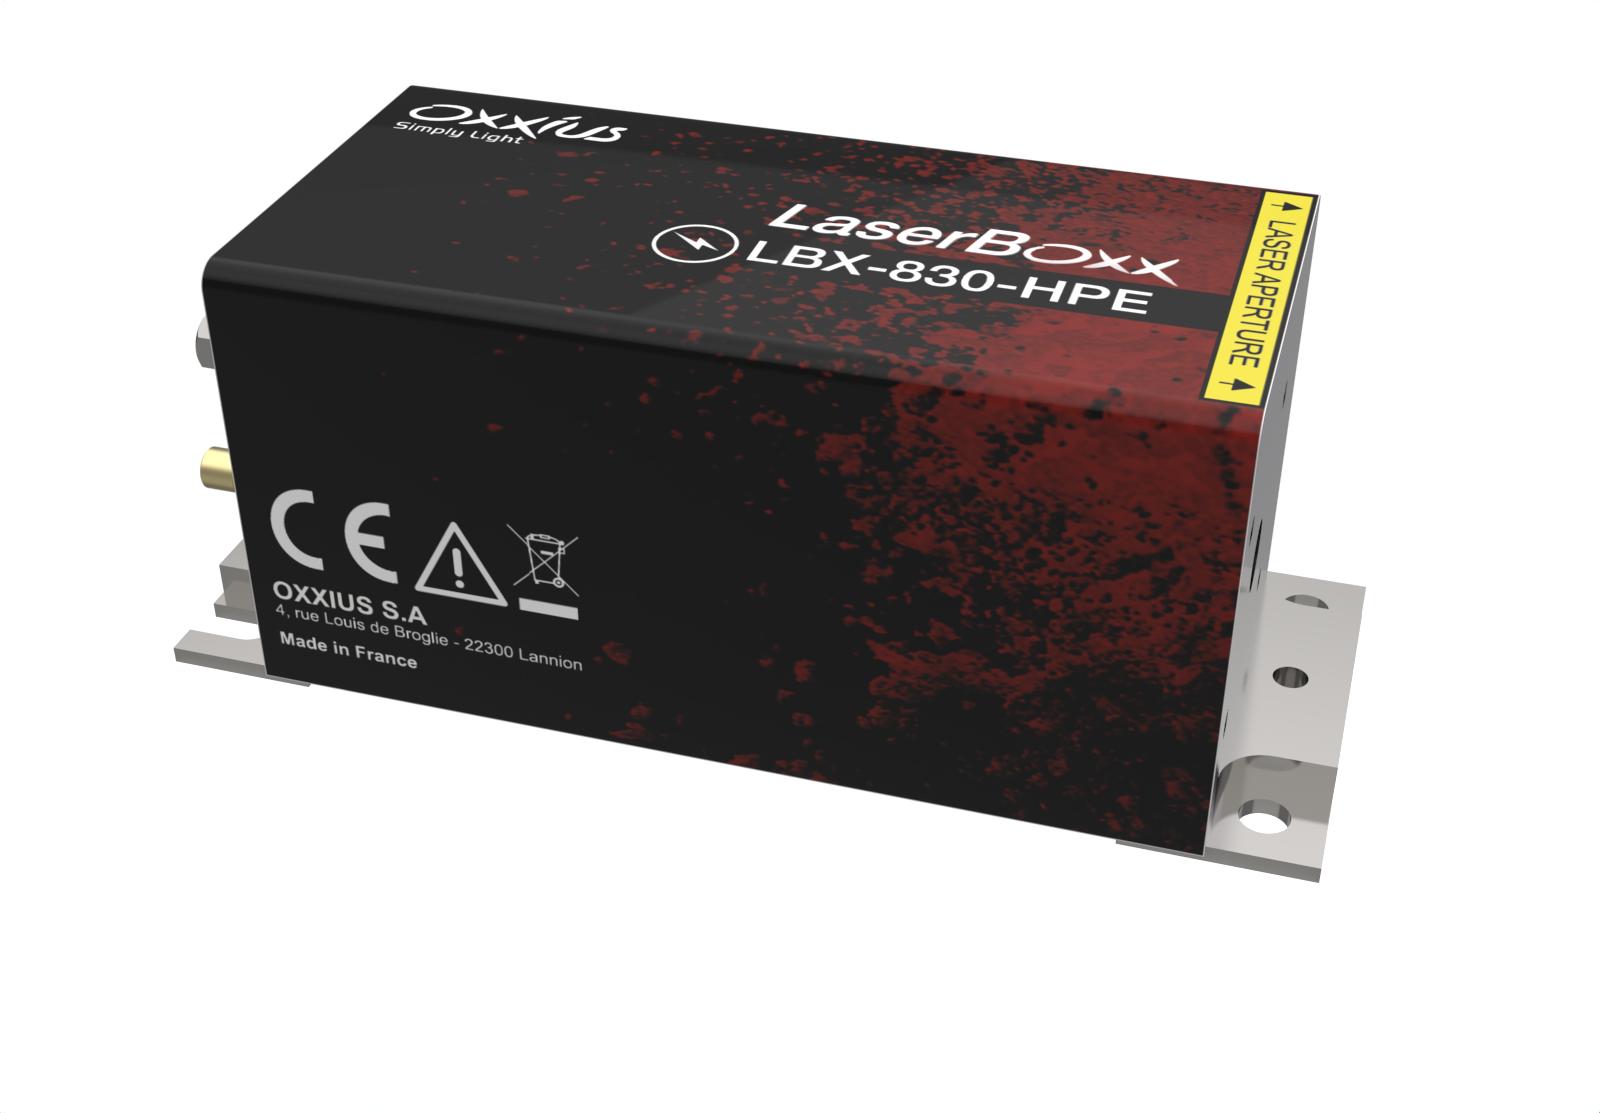 LBX-785-400-HPE